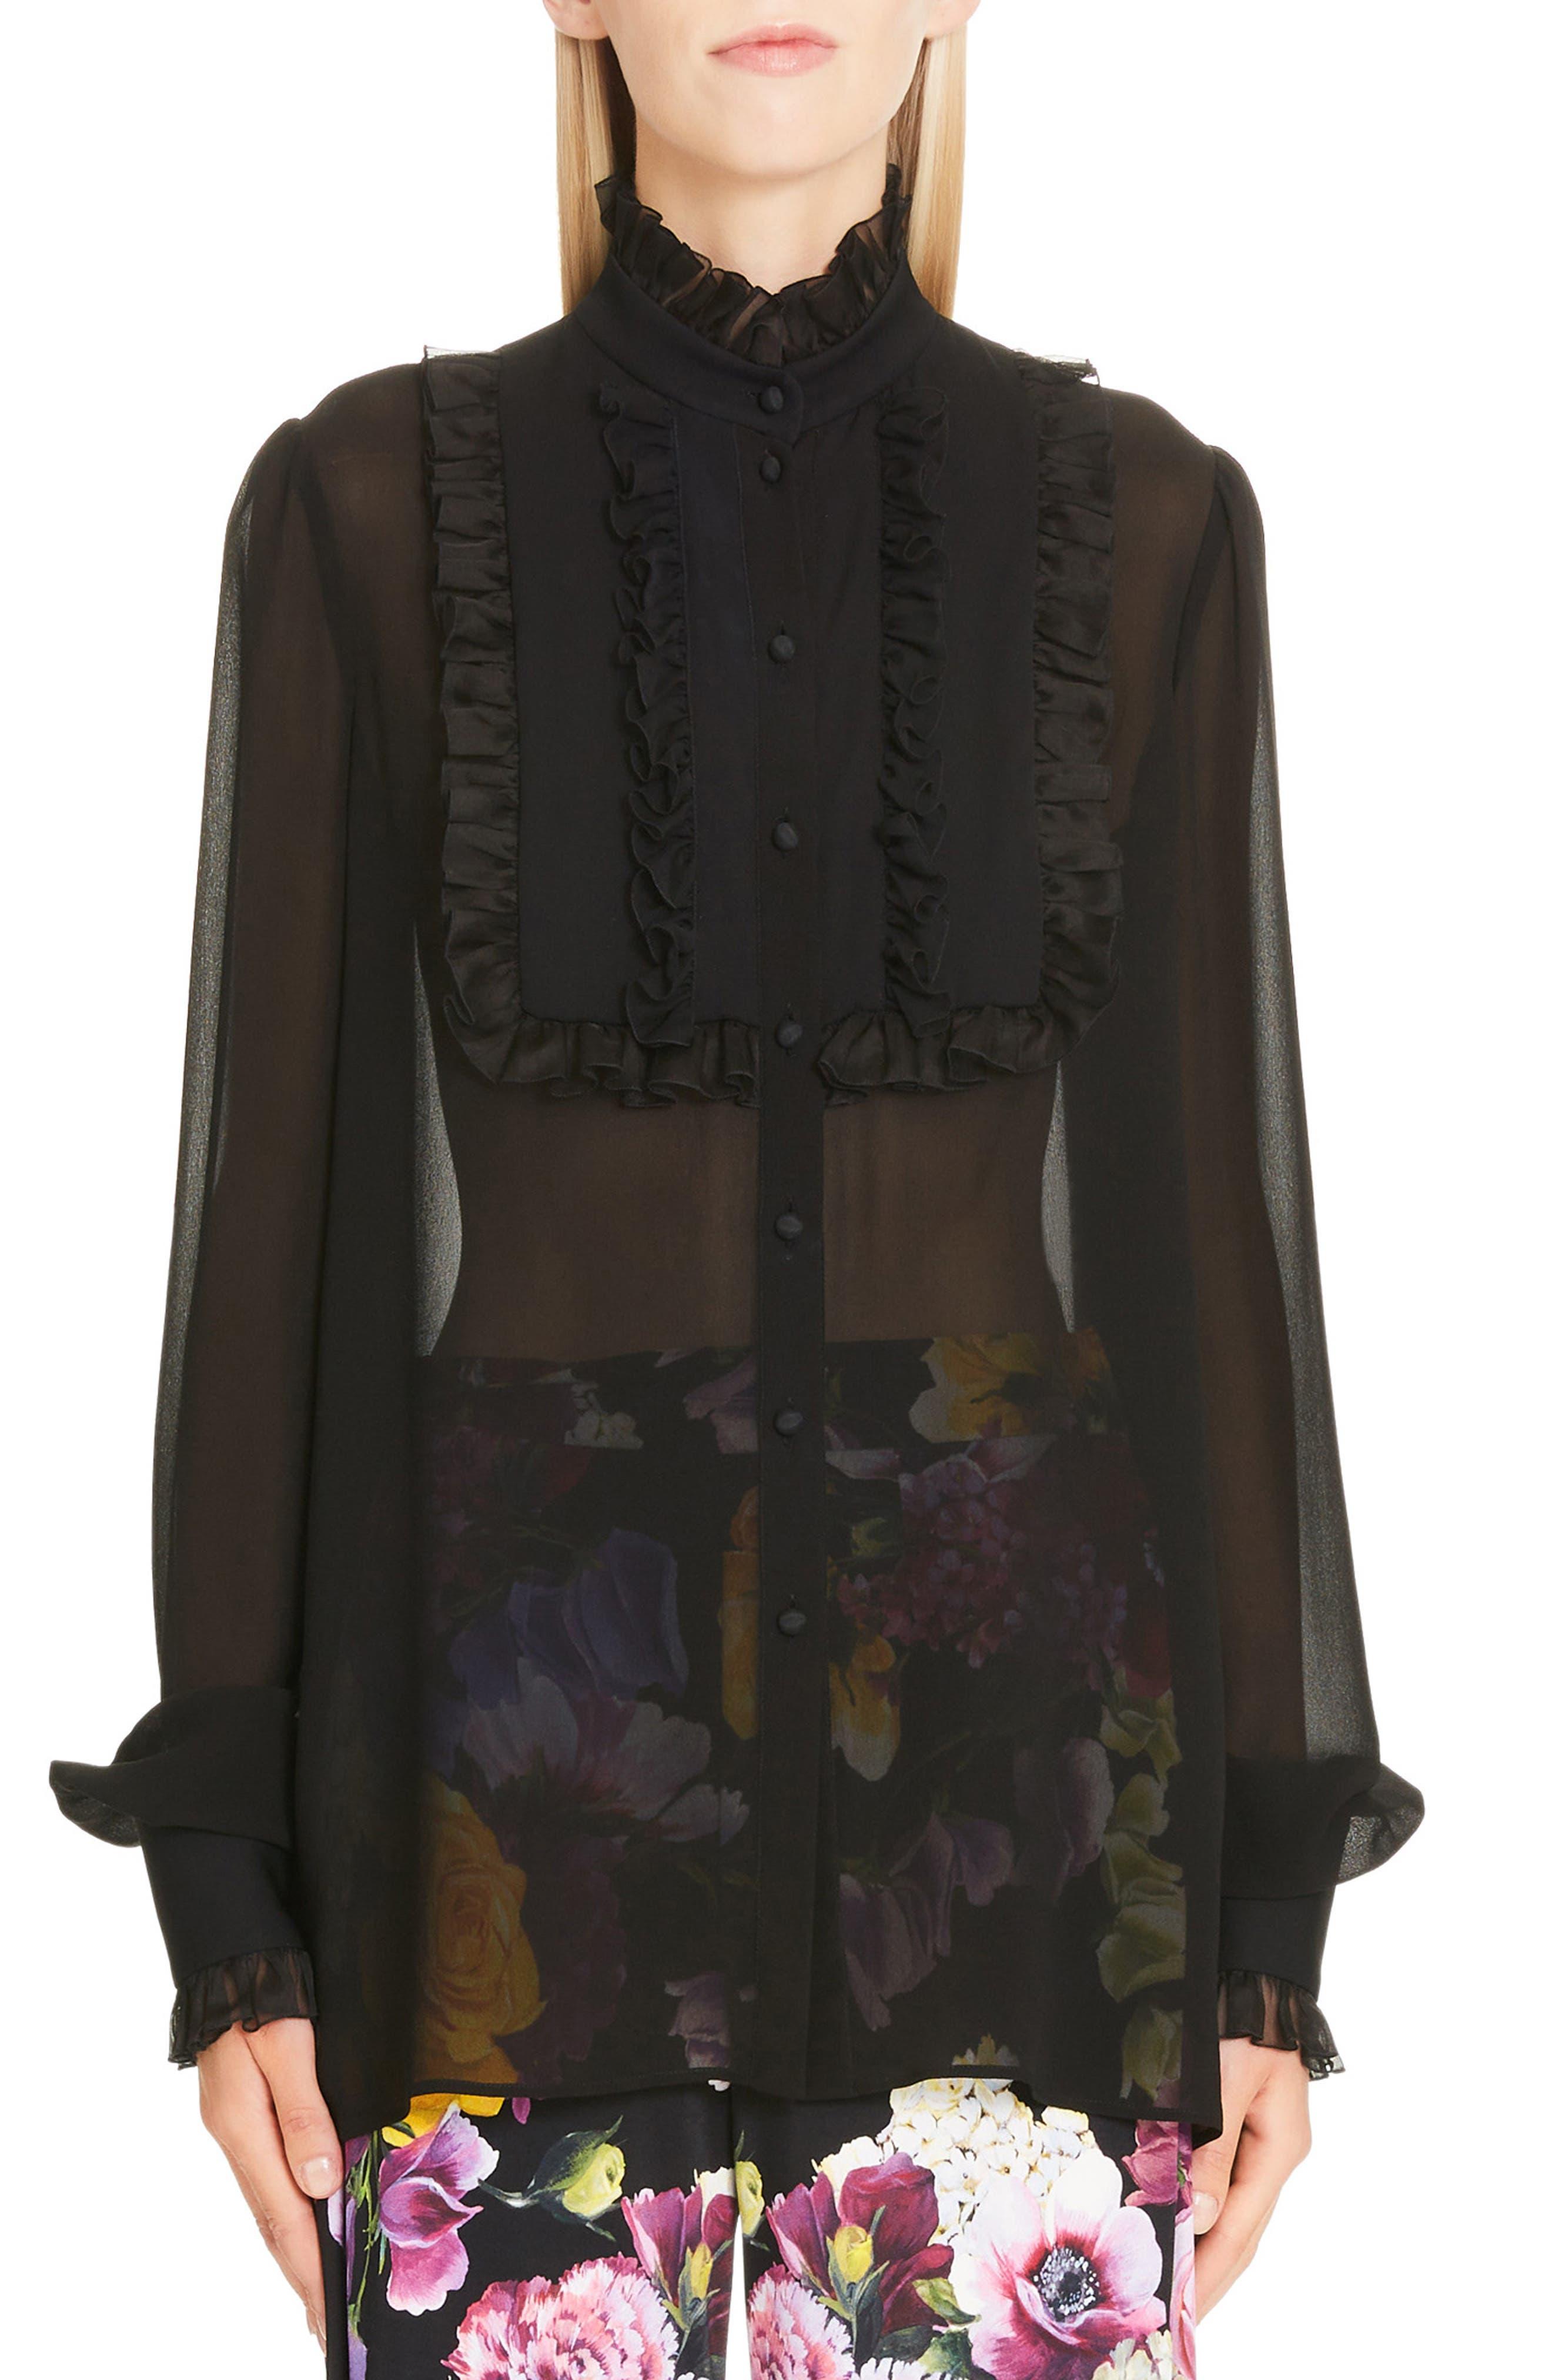 ef534dd1bfac7b Women's Dolce&Gabbana Clothing | Nordstrom